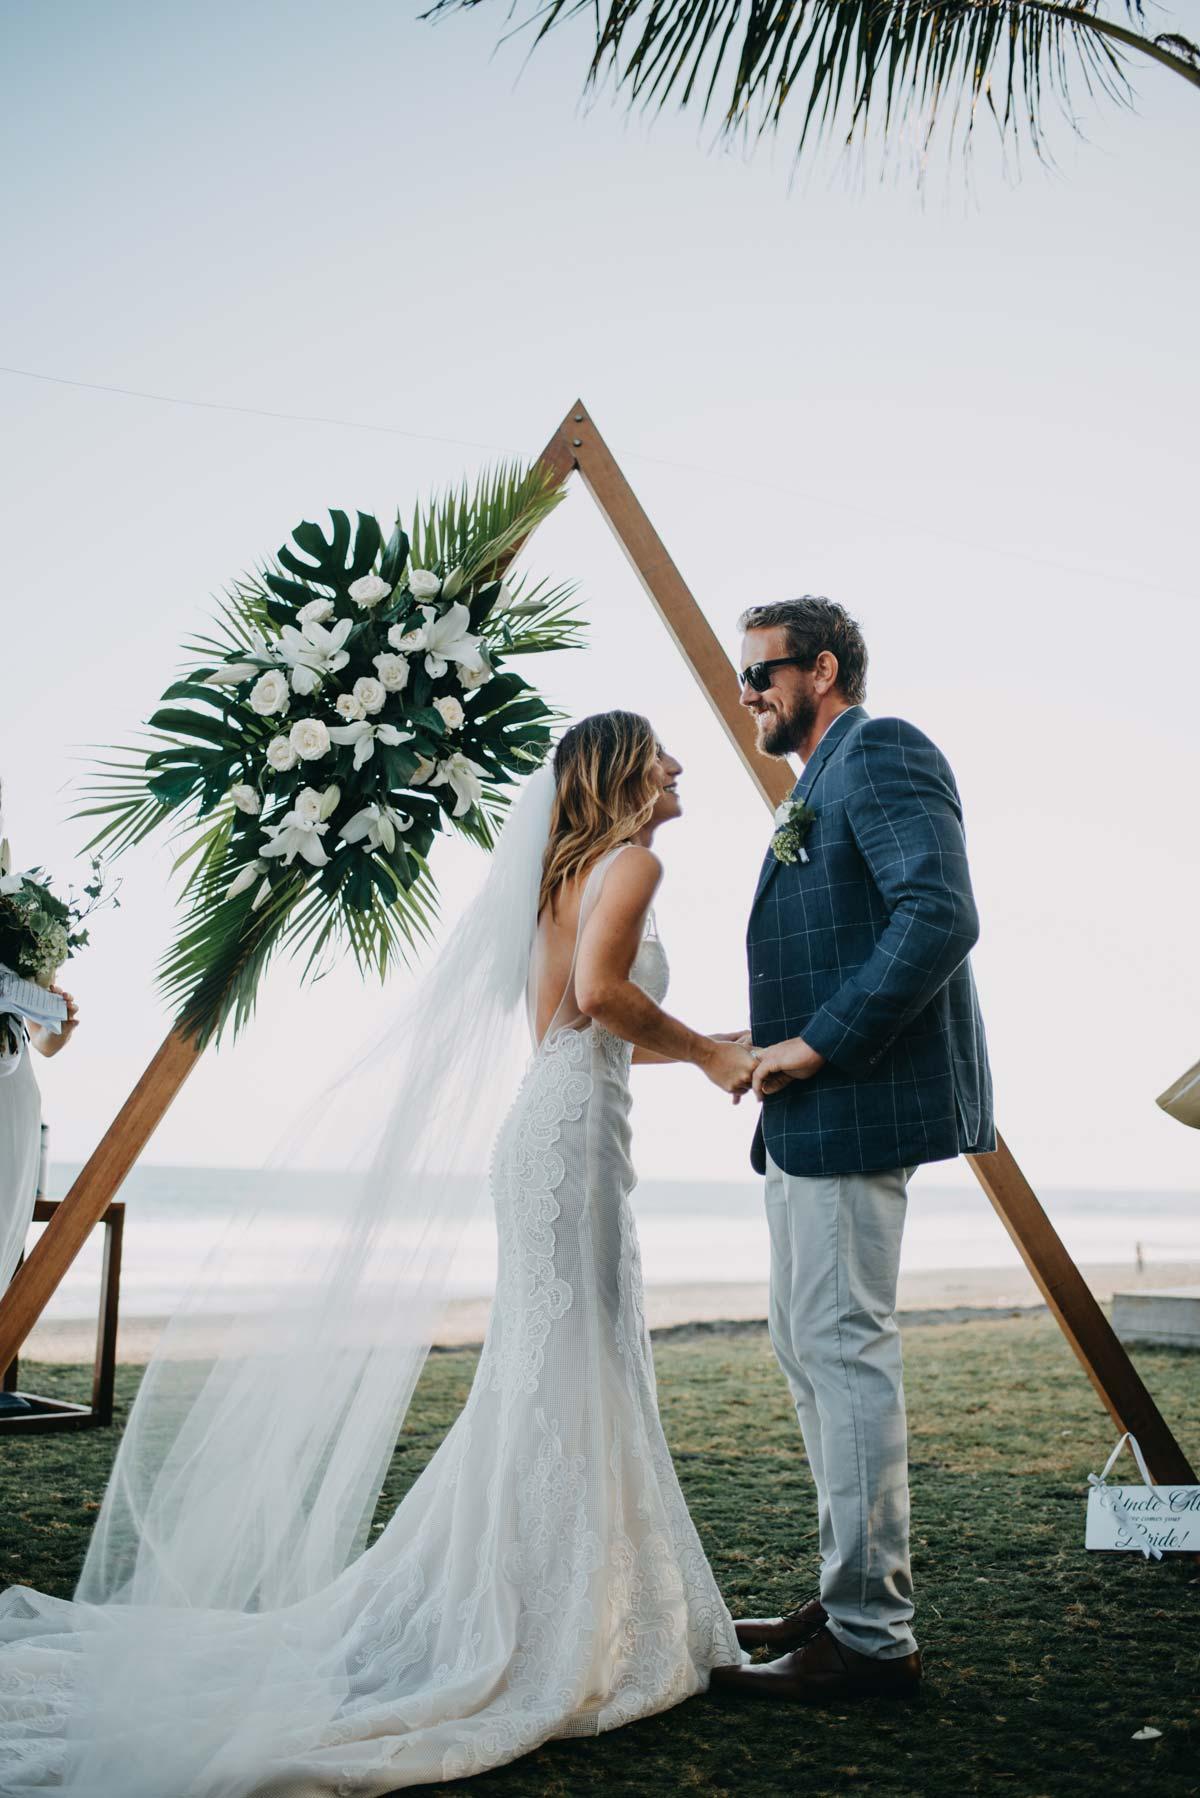 Gemma+Oli Delphinium Wedding Dress Bali Ceremony Arch Web 9496